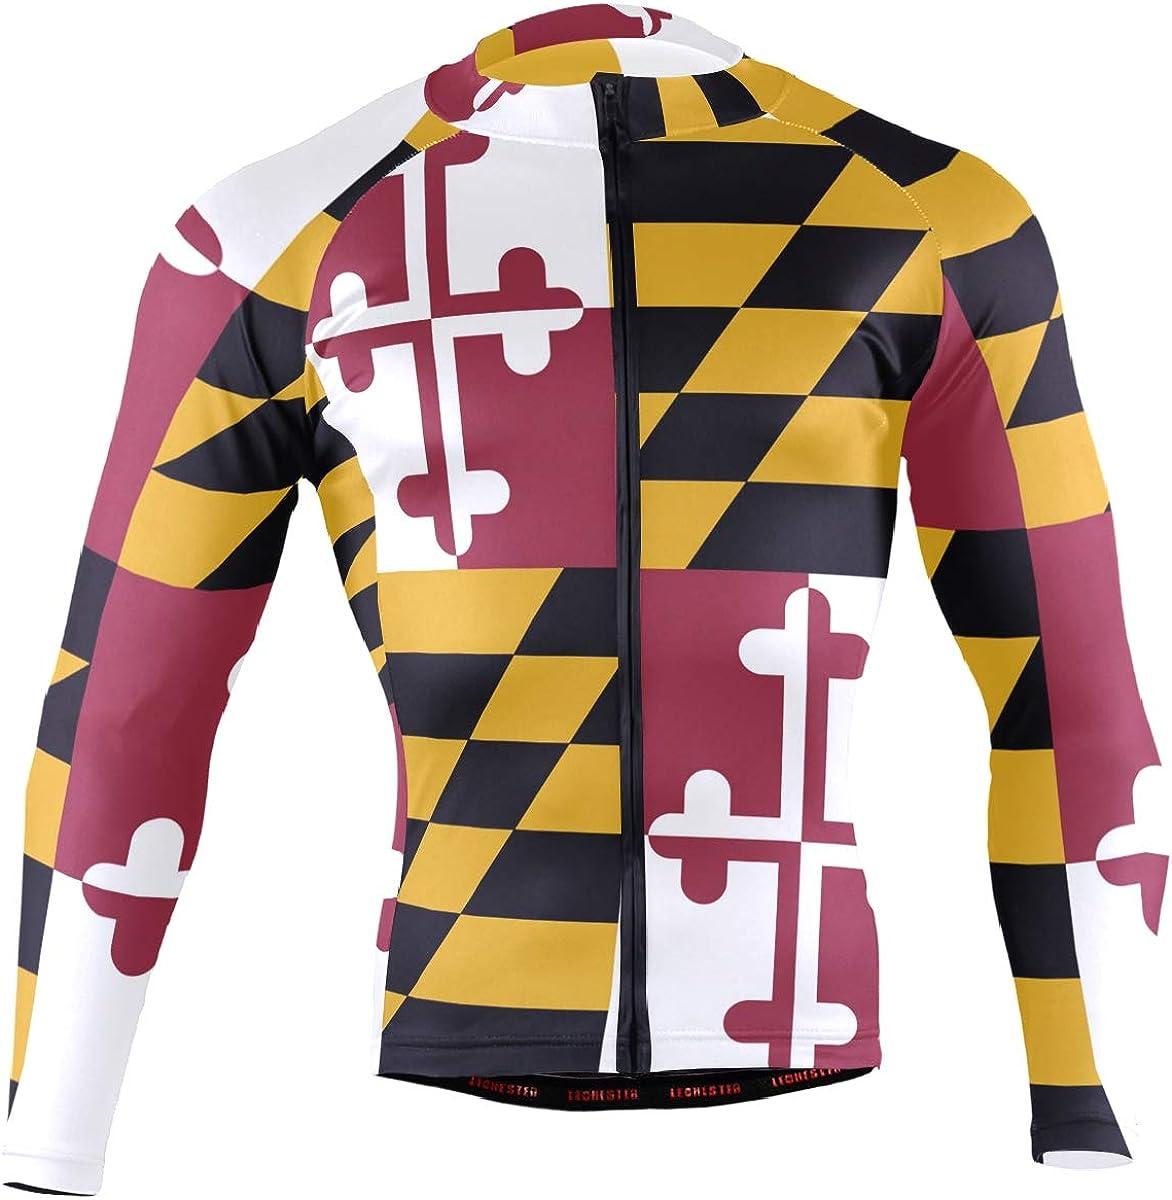 DerlonKaje Maryland Flag NEW before selling Men's Cycling Long Sleeve Jersey Award Breath